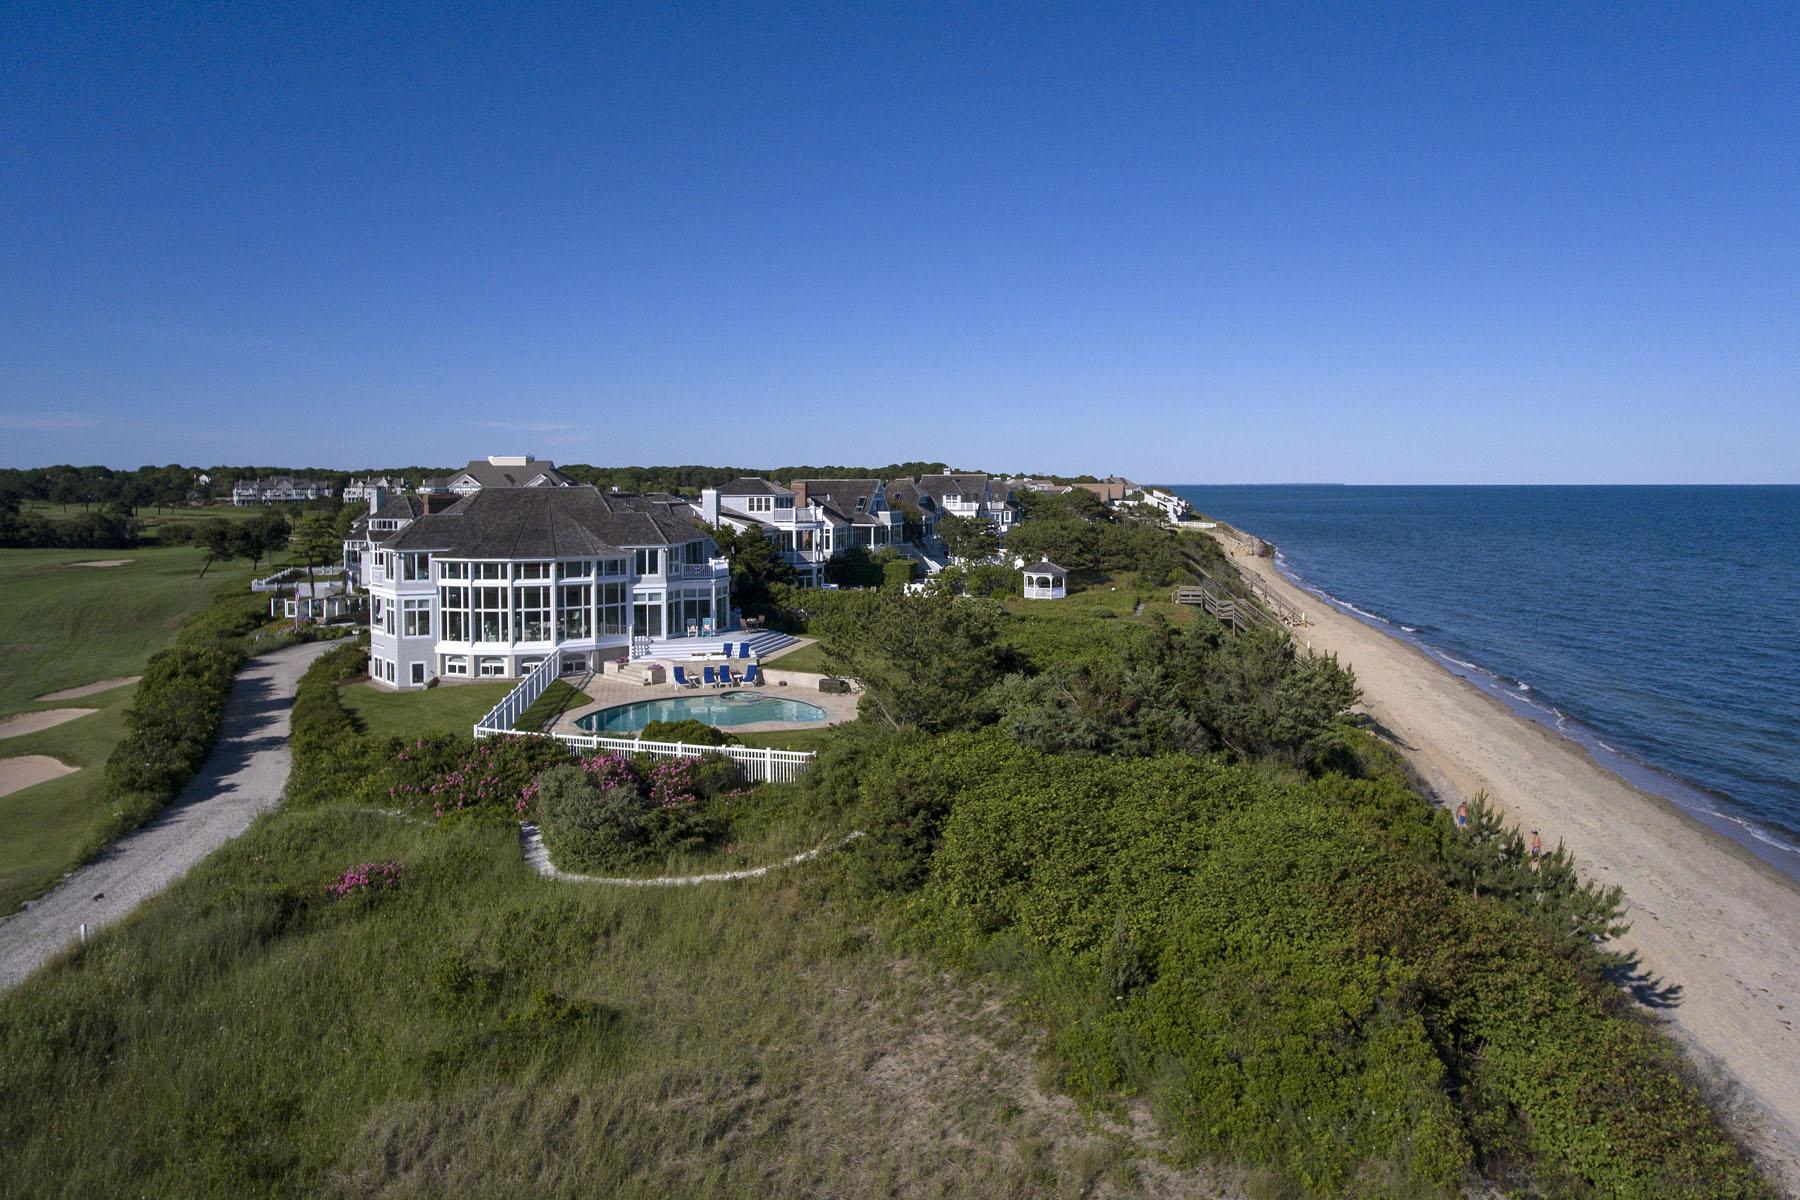 独户住宅 为 销售 在 ONCE IN A LIFE TIME! 134 Shore Drive West 席比义, 马萨诸塞州, 02649 美国